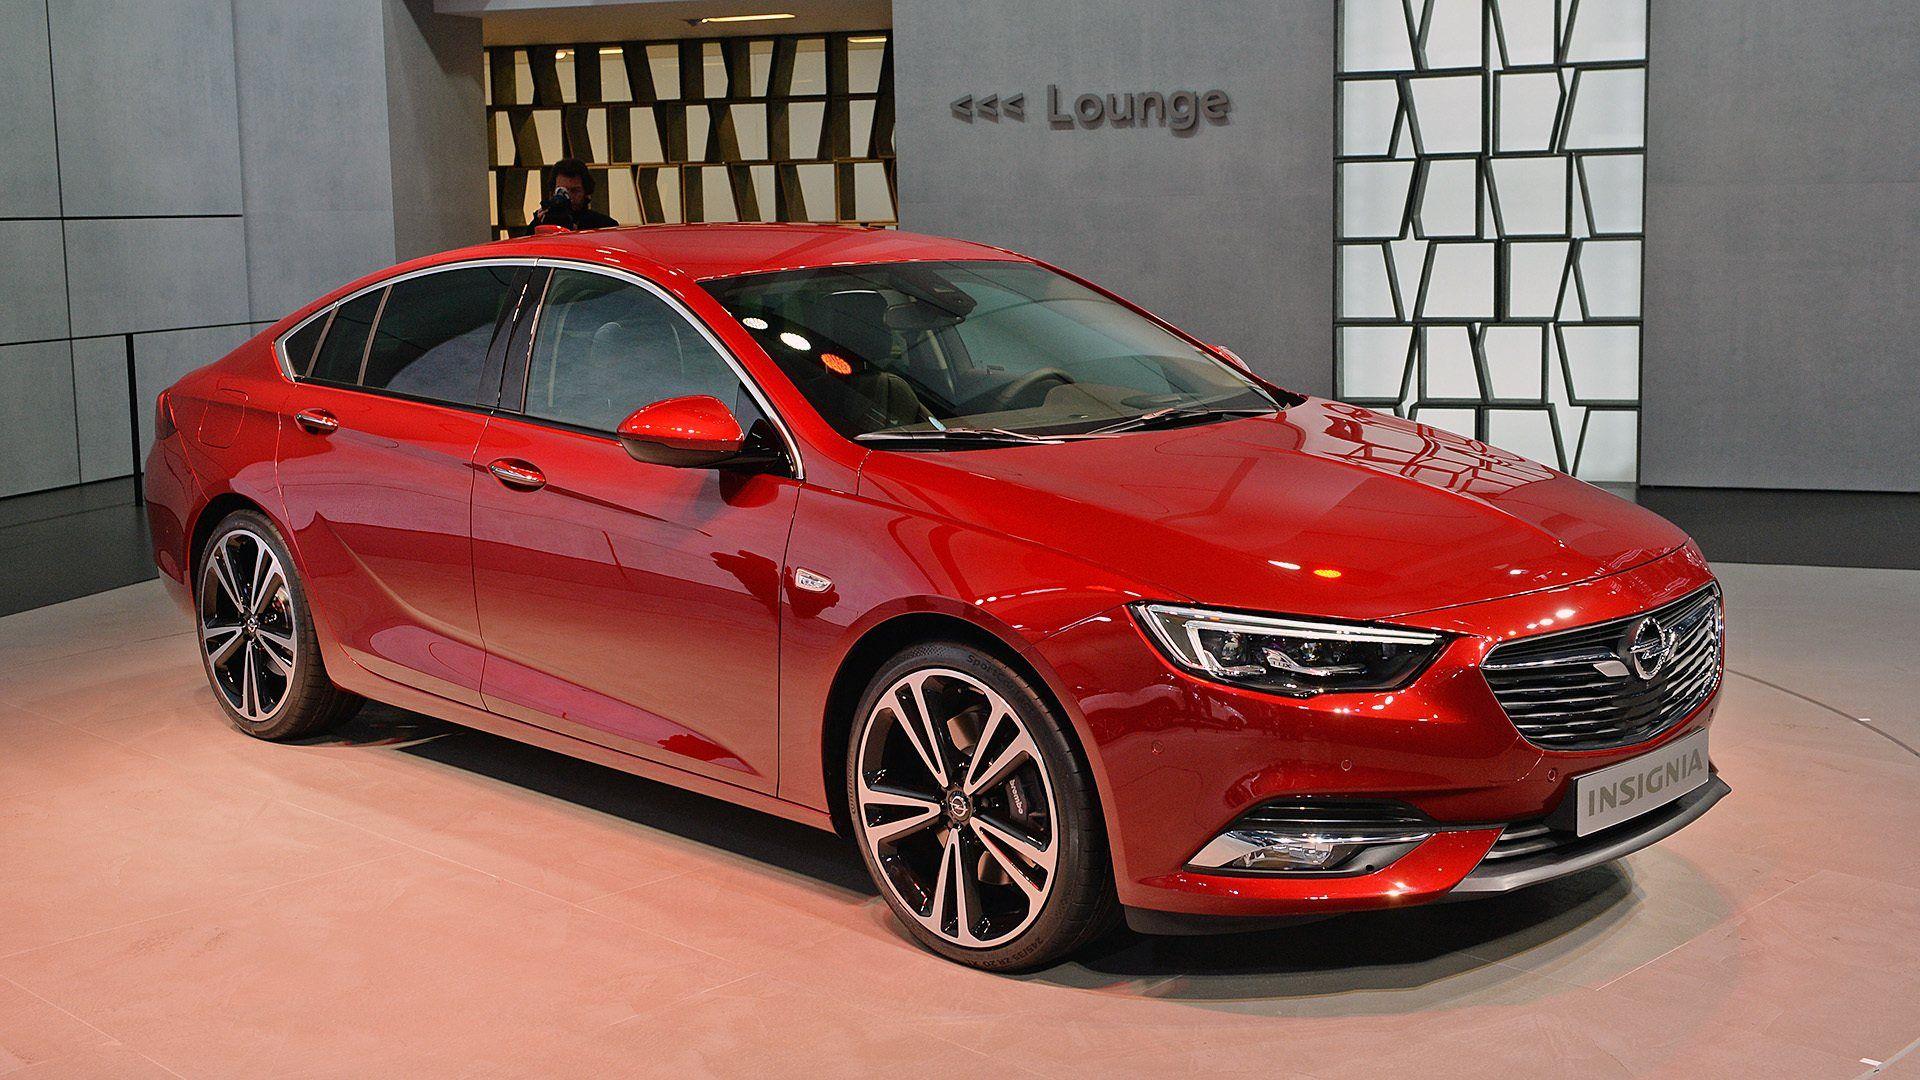 2021 New Opel Insignia Release In 2020 Geneva Motor Show Opel Vauxhall Insignia